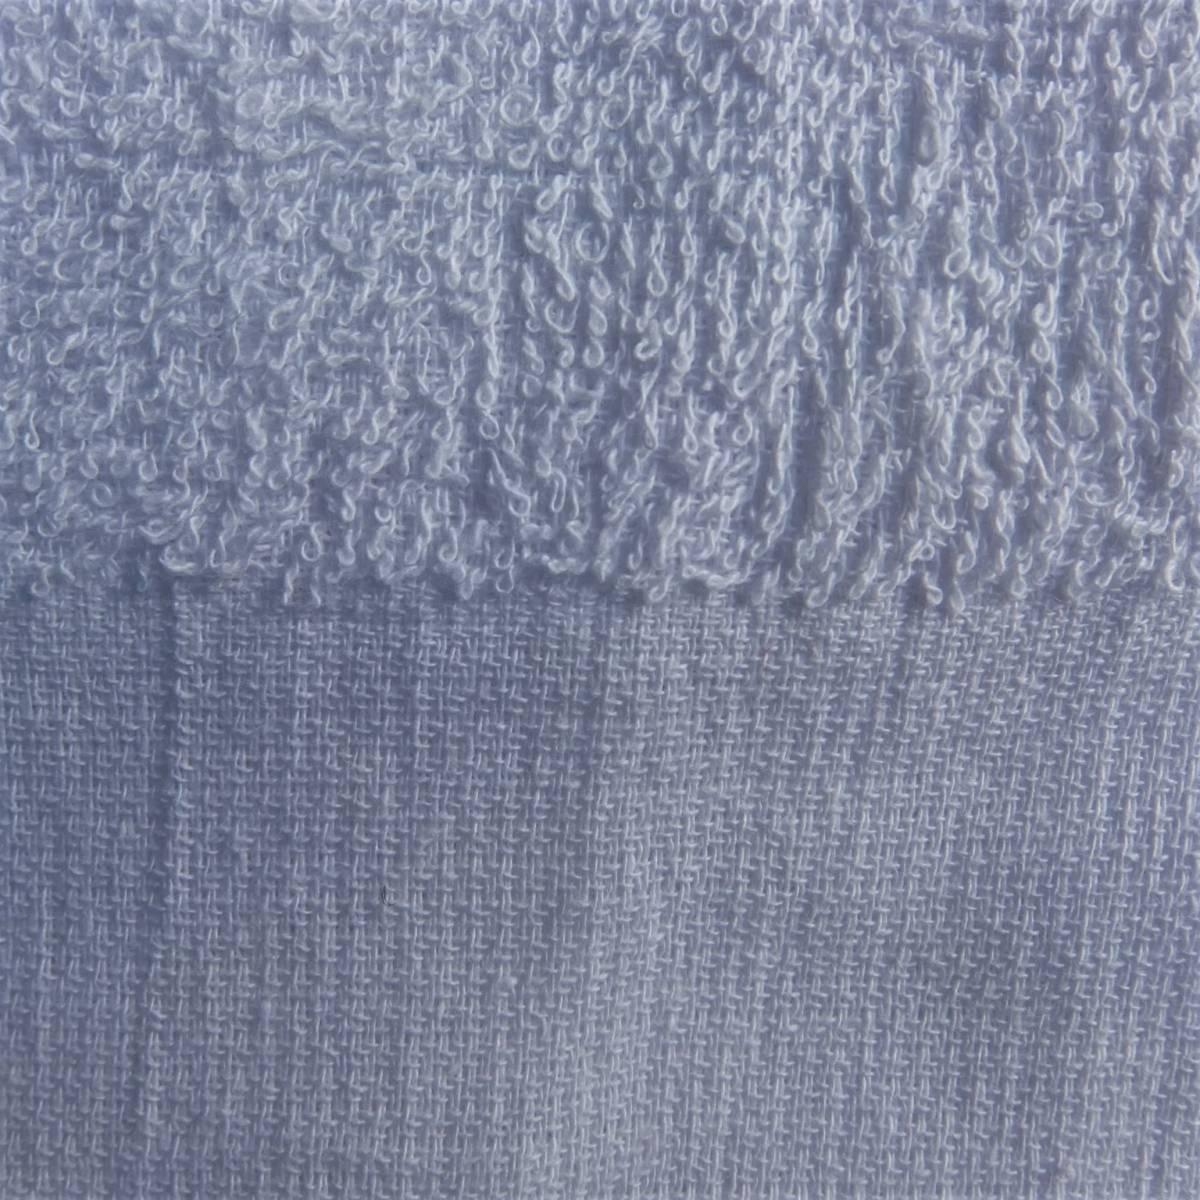 T-002A まとめて600枚 輸入品 白タオル フェイスタオル 180匁 VIE180 平地付 綿100% 格安 雑巾 介護 ウエス タオル 白 業務用 新品_画像3